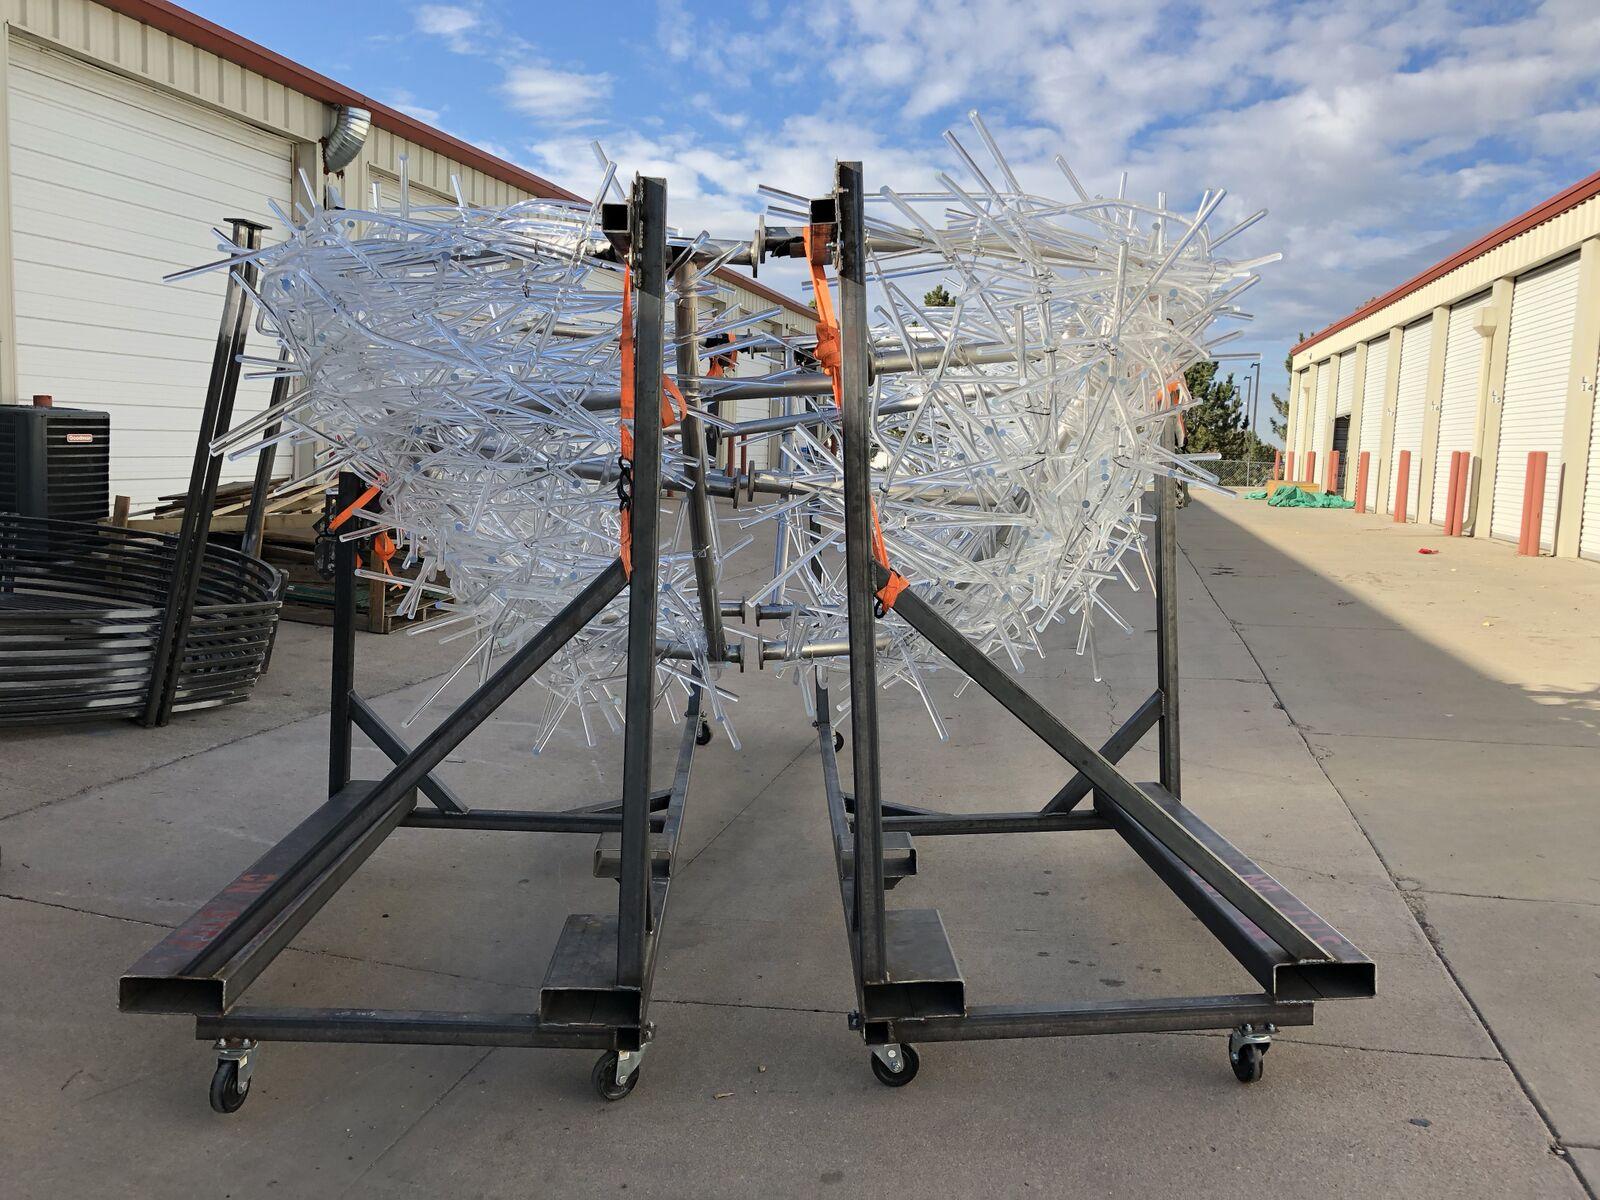 Calgary_The Nest_Donald Lipski_Public Art Services_J Grant Projects_23.jpeg